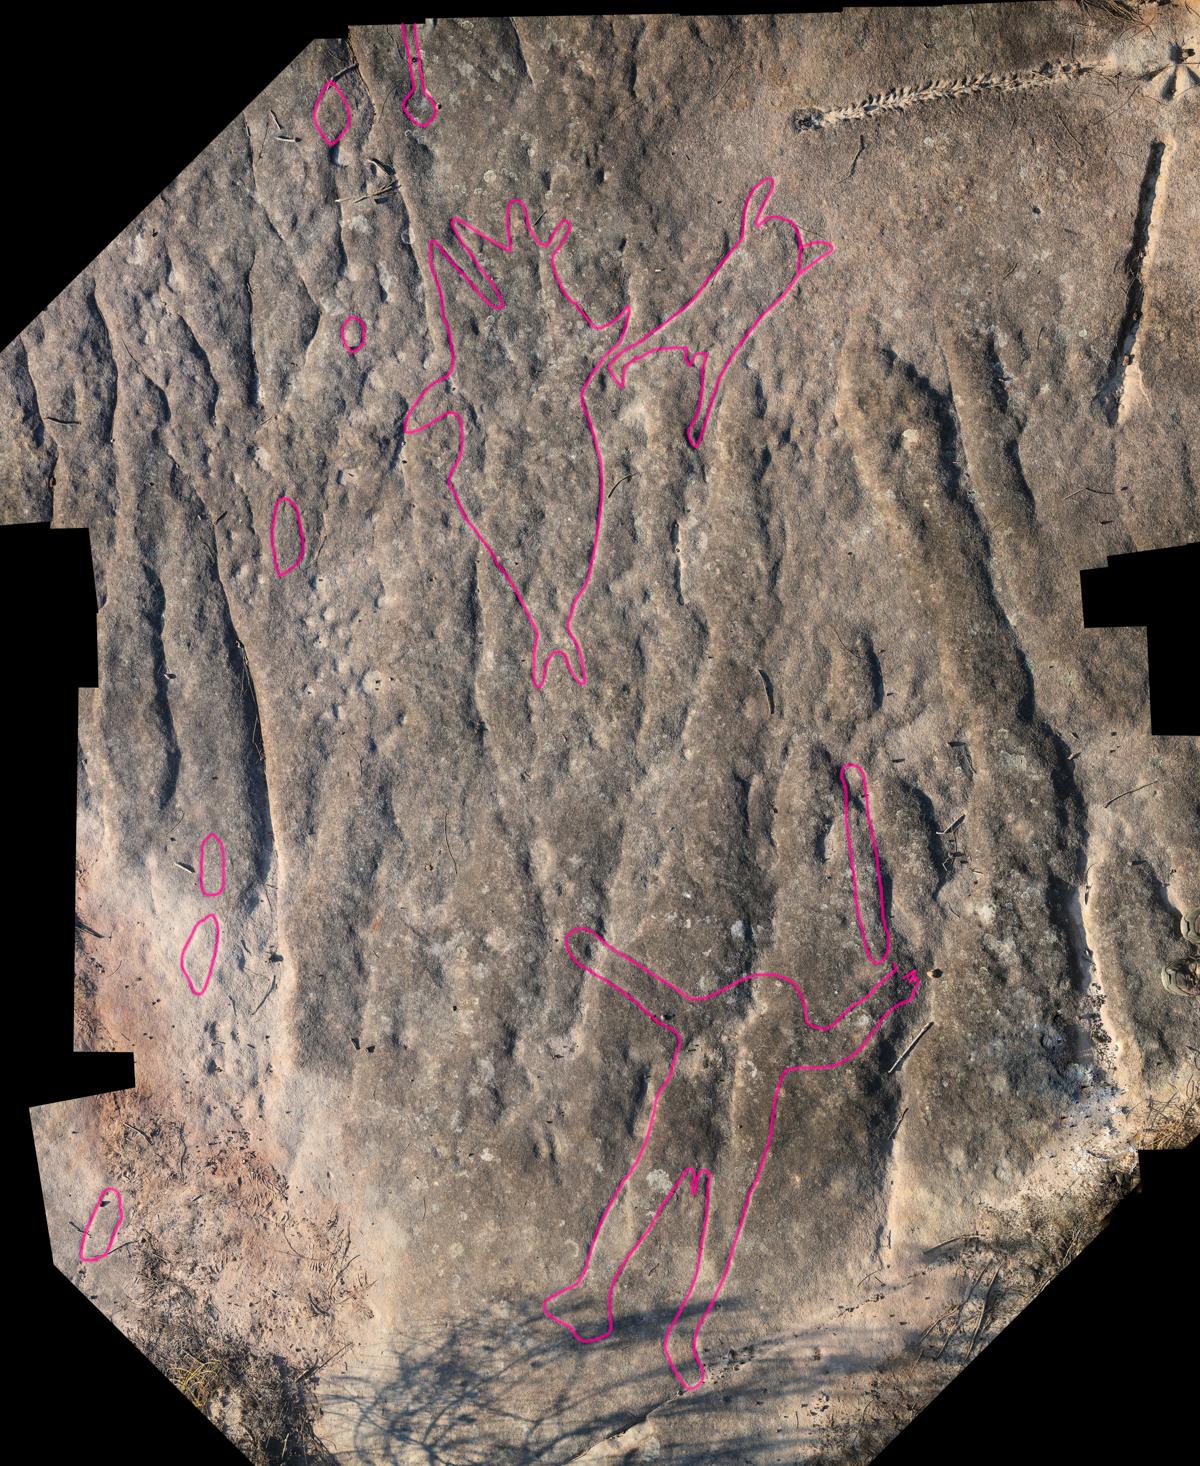 montage1b LR Photographing Aboriginal rock art